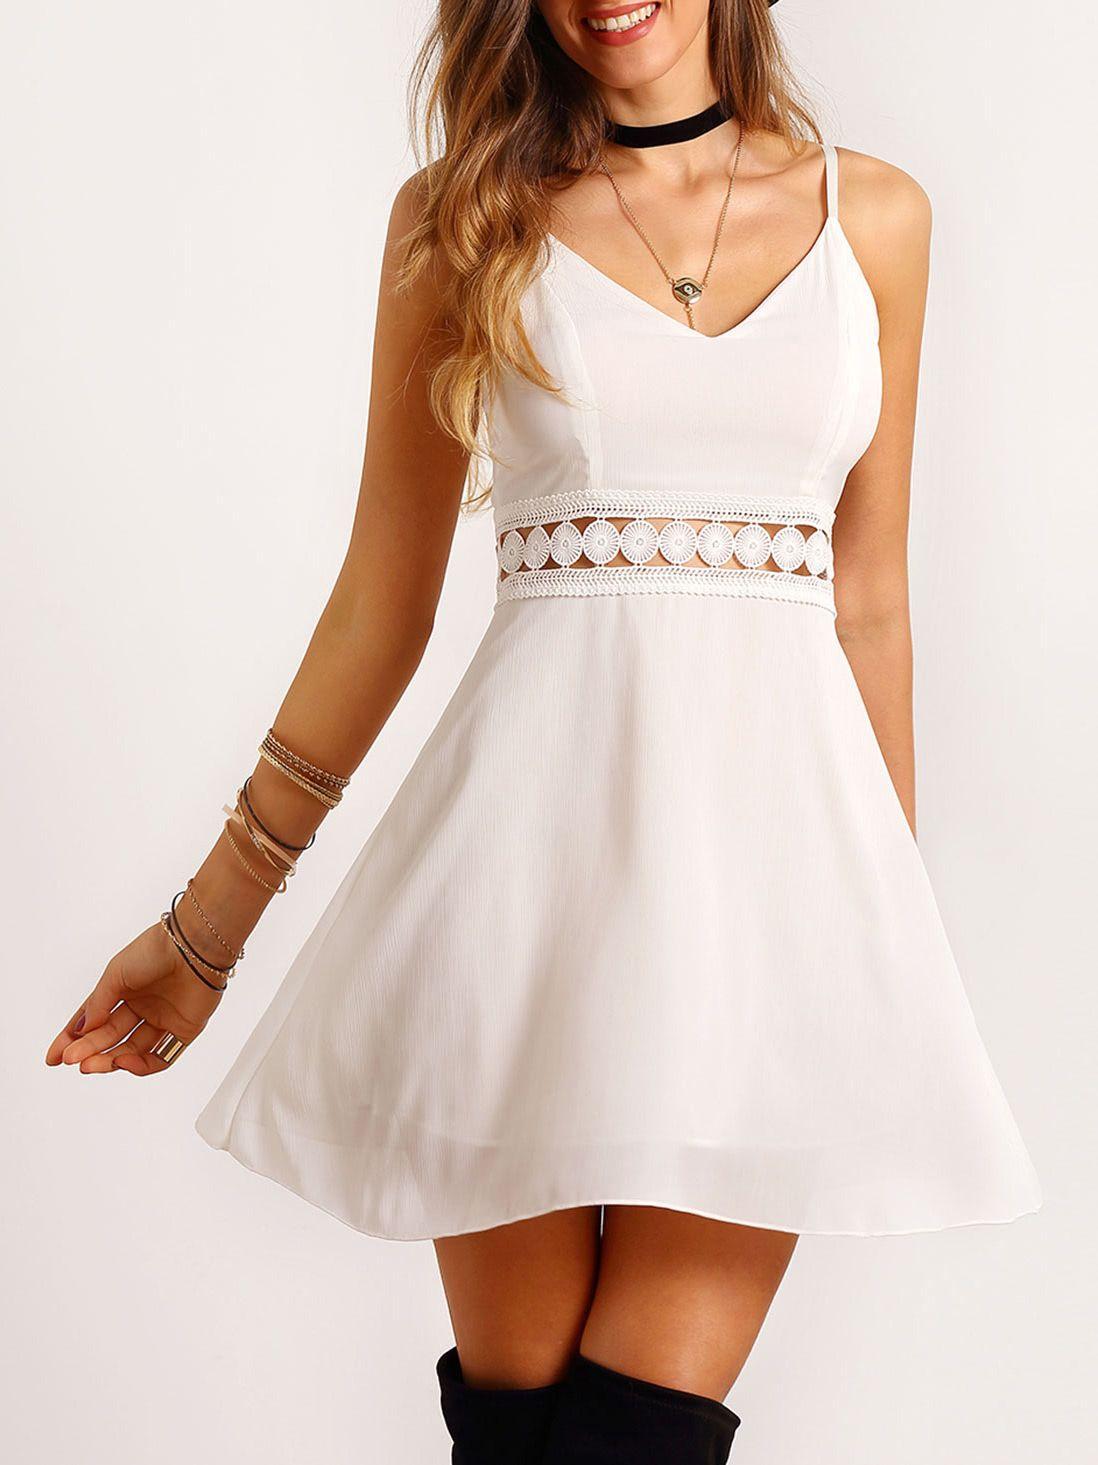 White Spaghetti Strap Lace Slim Dress  Slim dresses, Chiffon mini